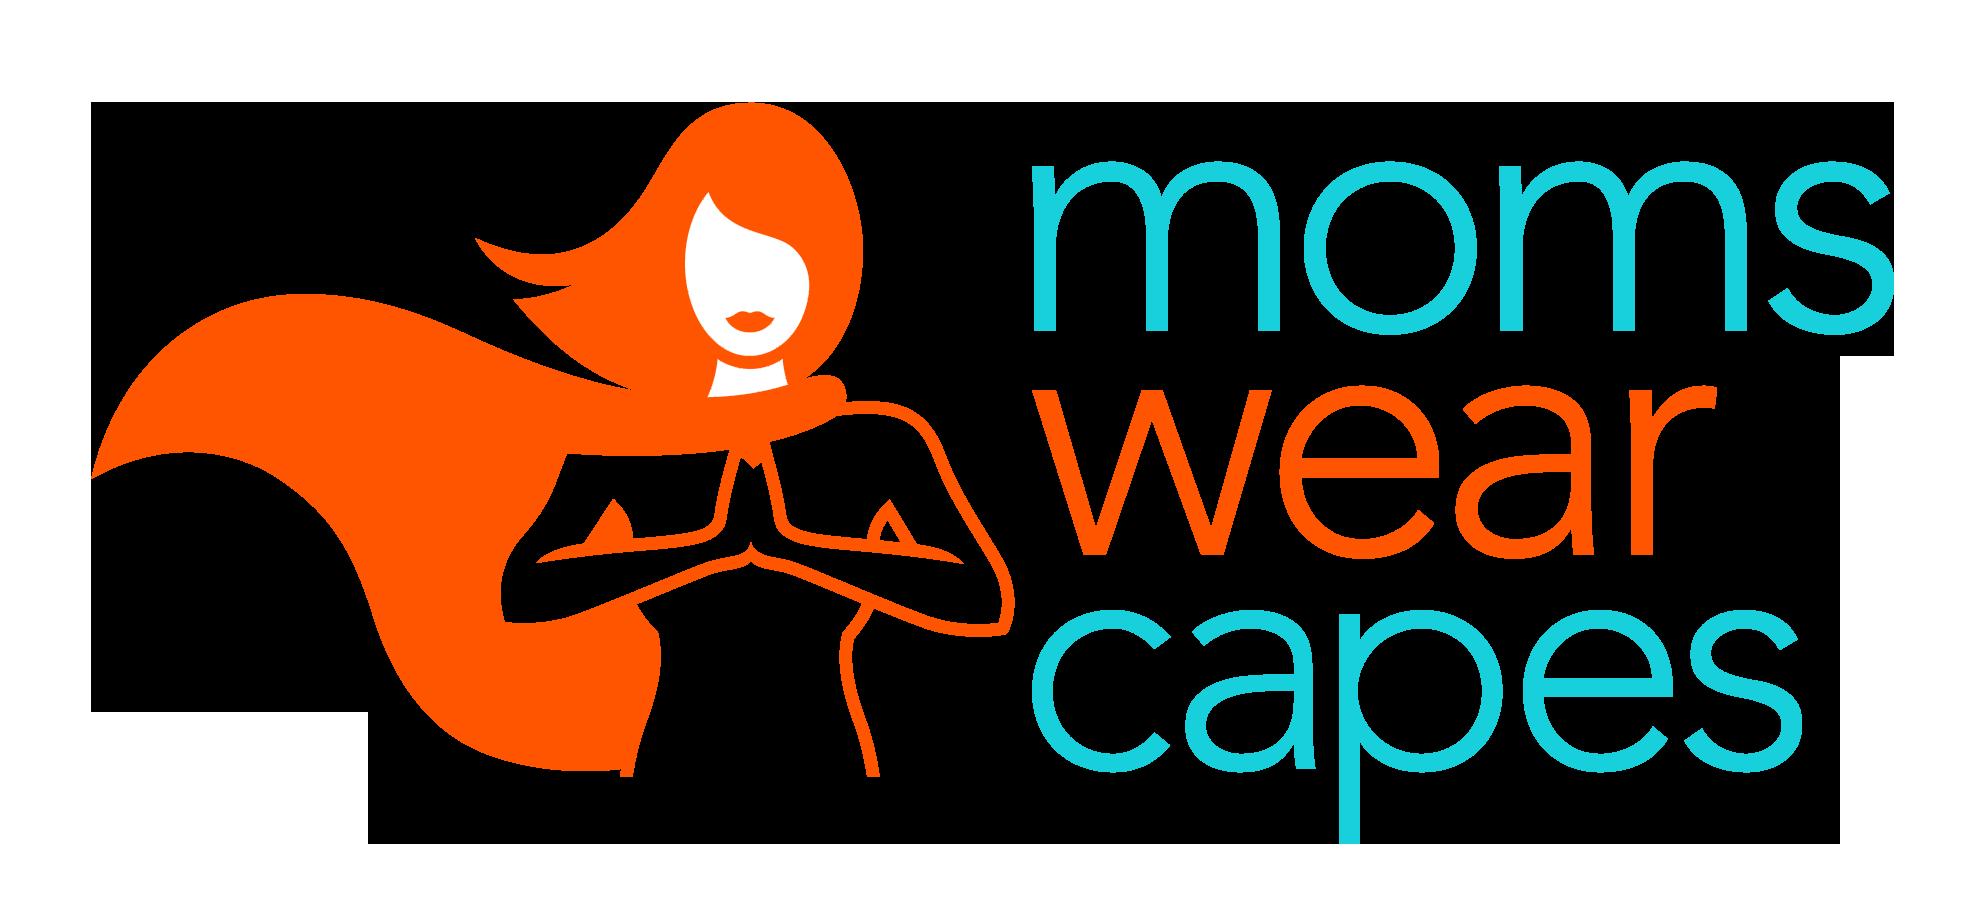 logo-revised (2).png